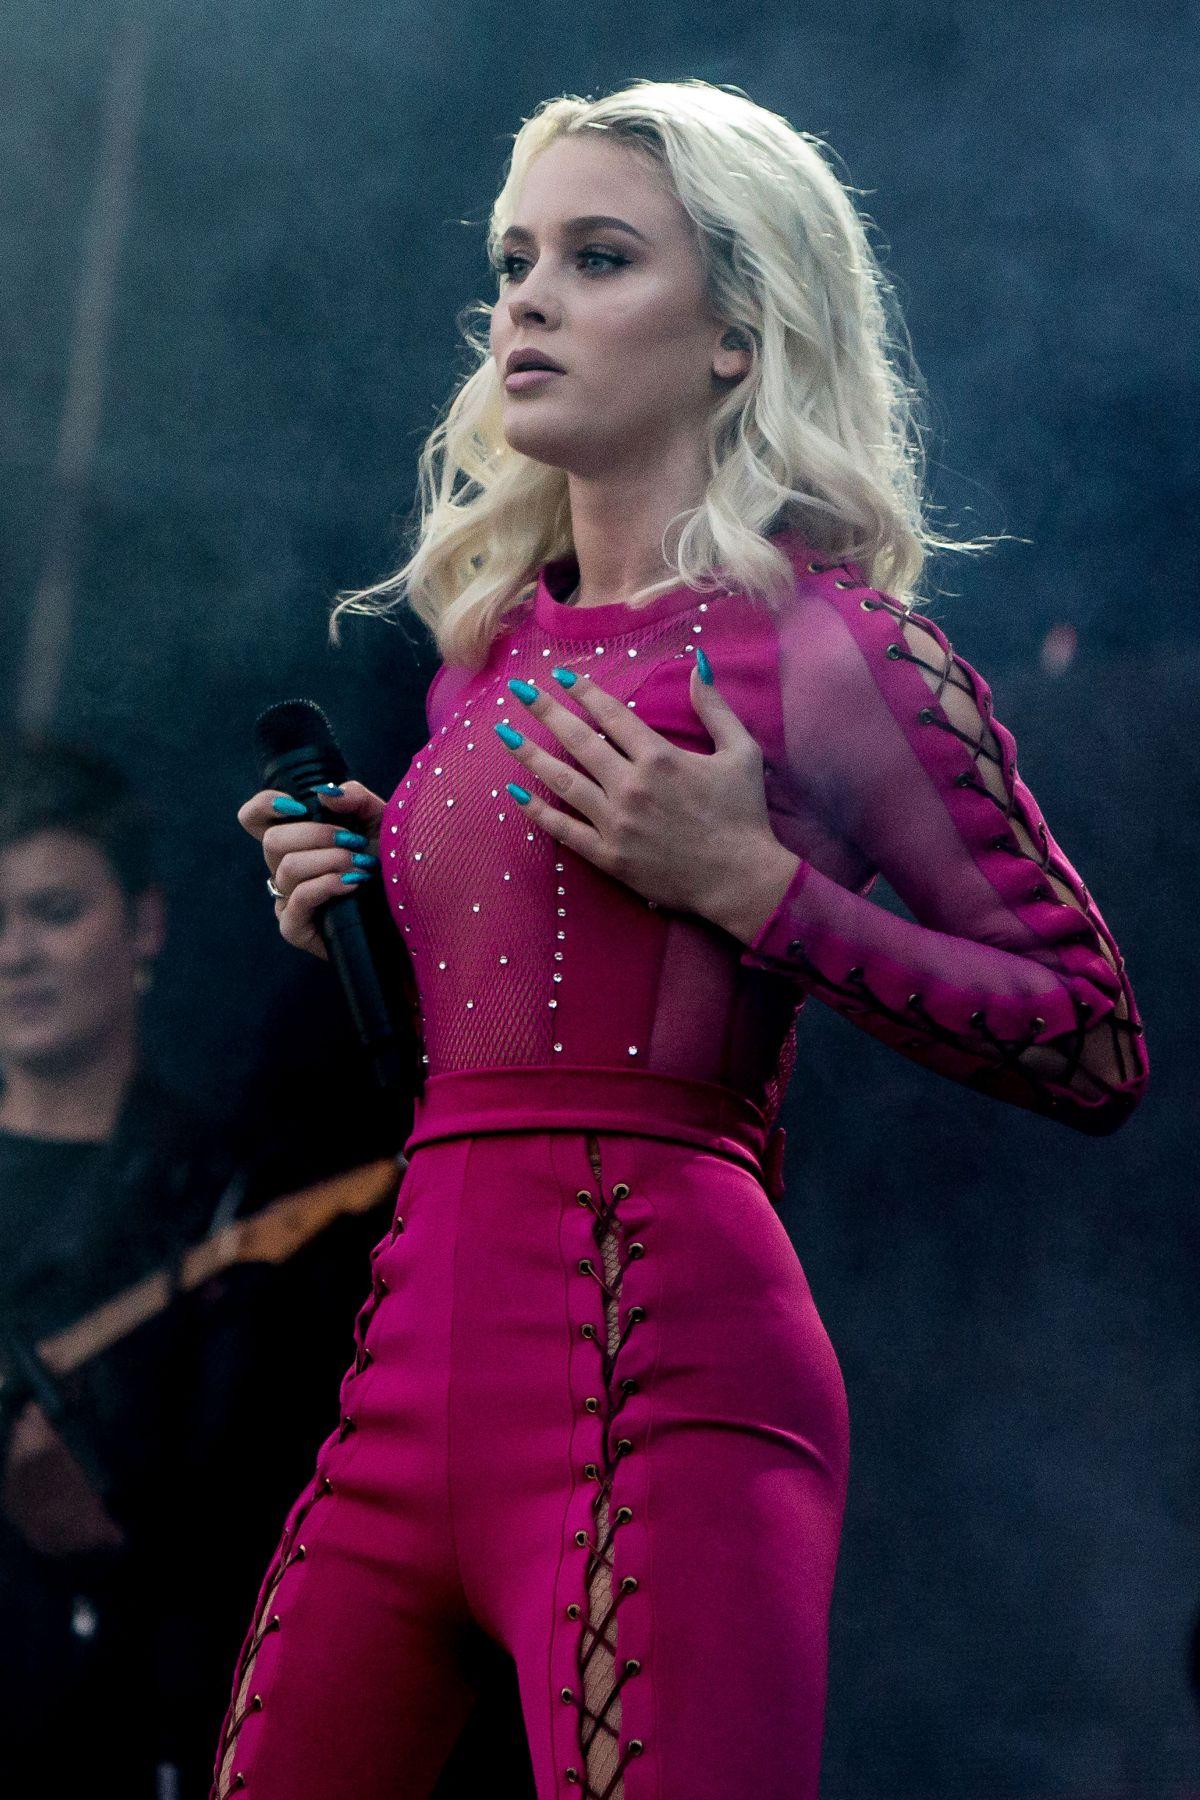 Zara Larsson Performs At Bravella Festival In Sweden 06302016  Hawtcelebs-3336